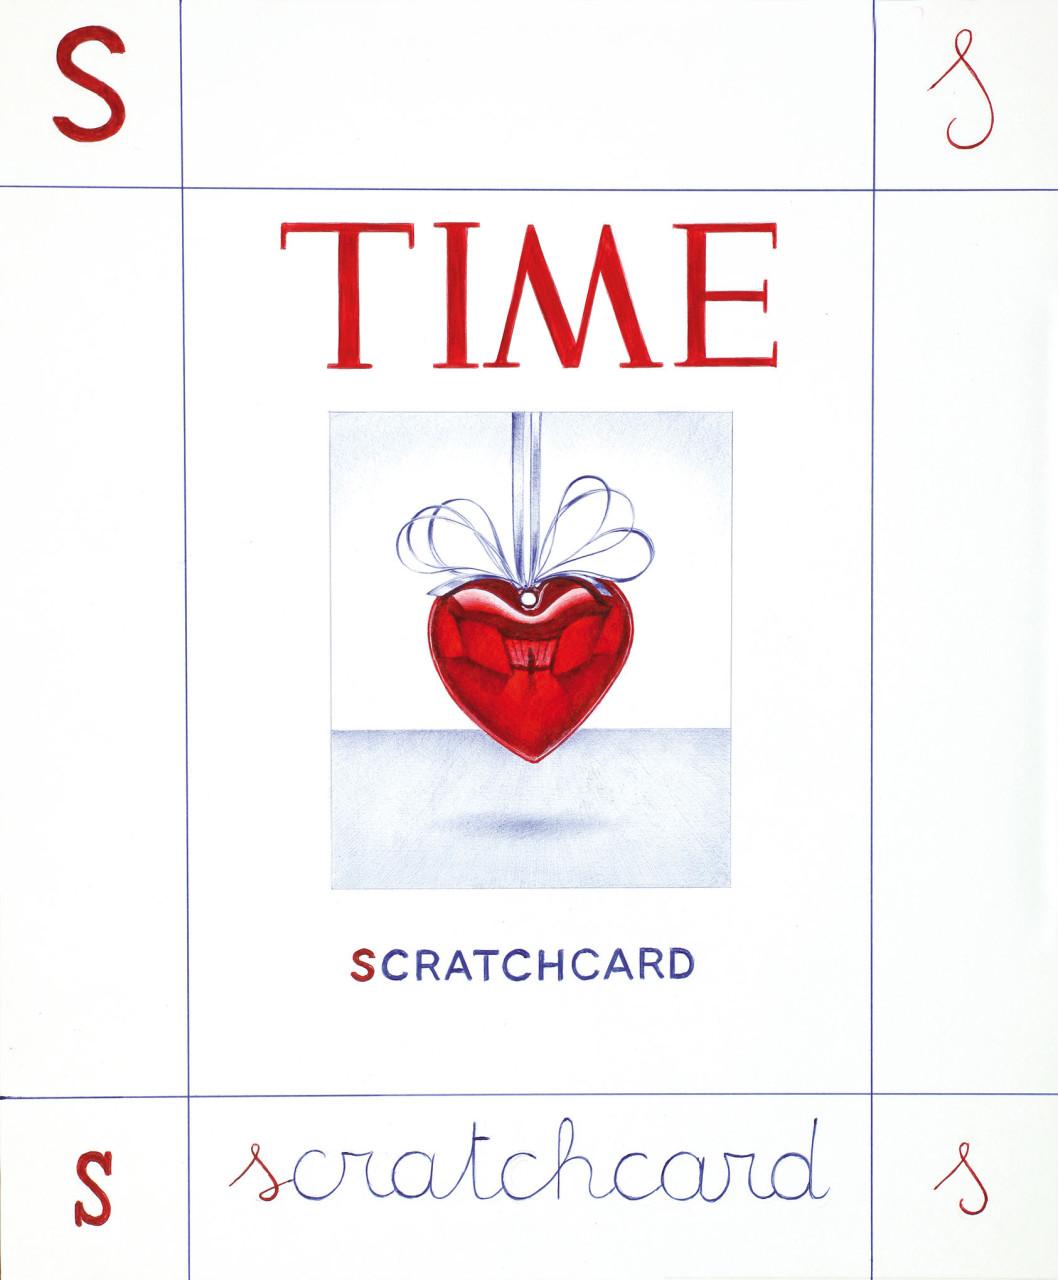 09S-scratchcard_bassa